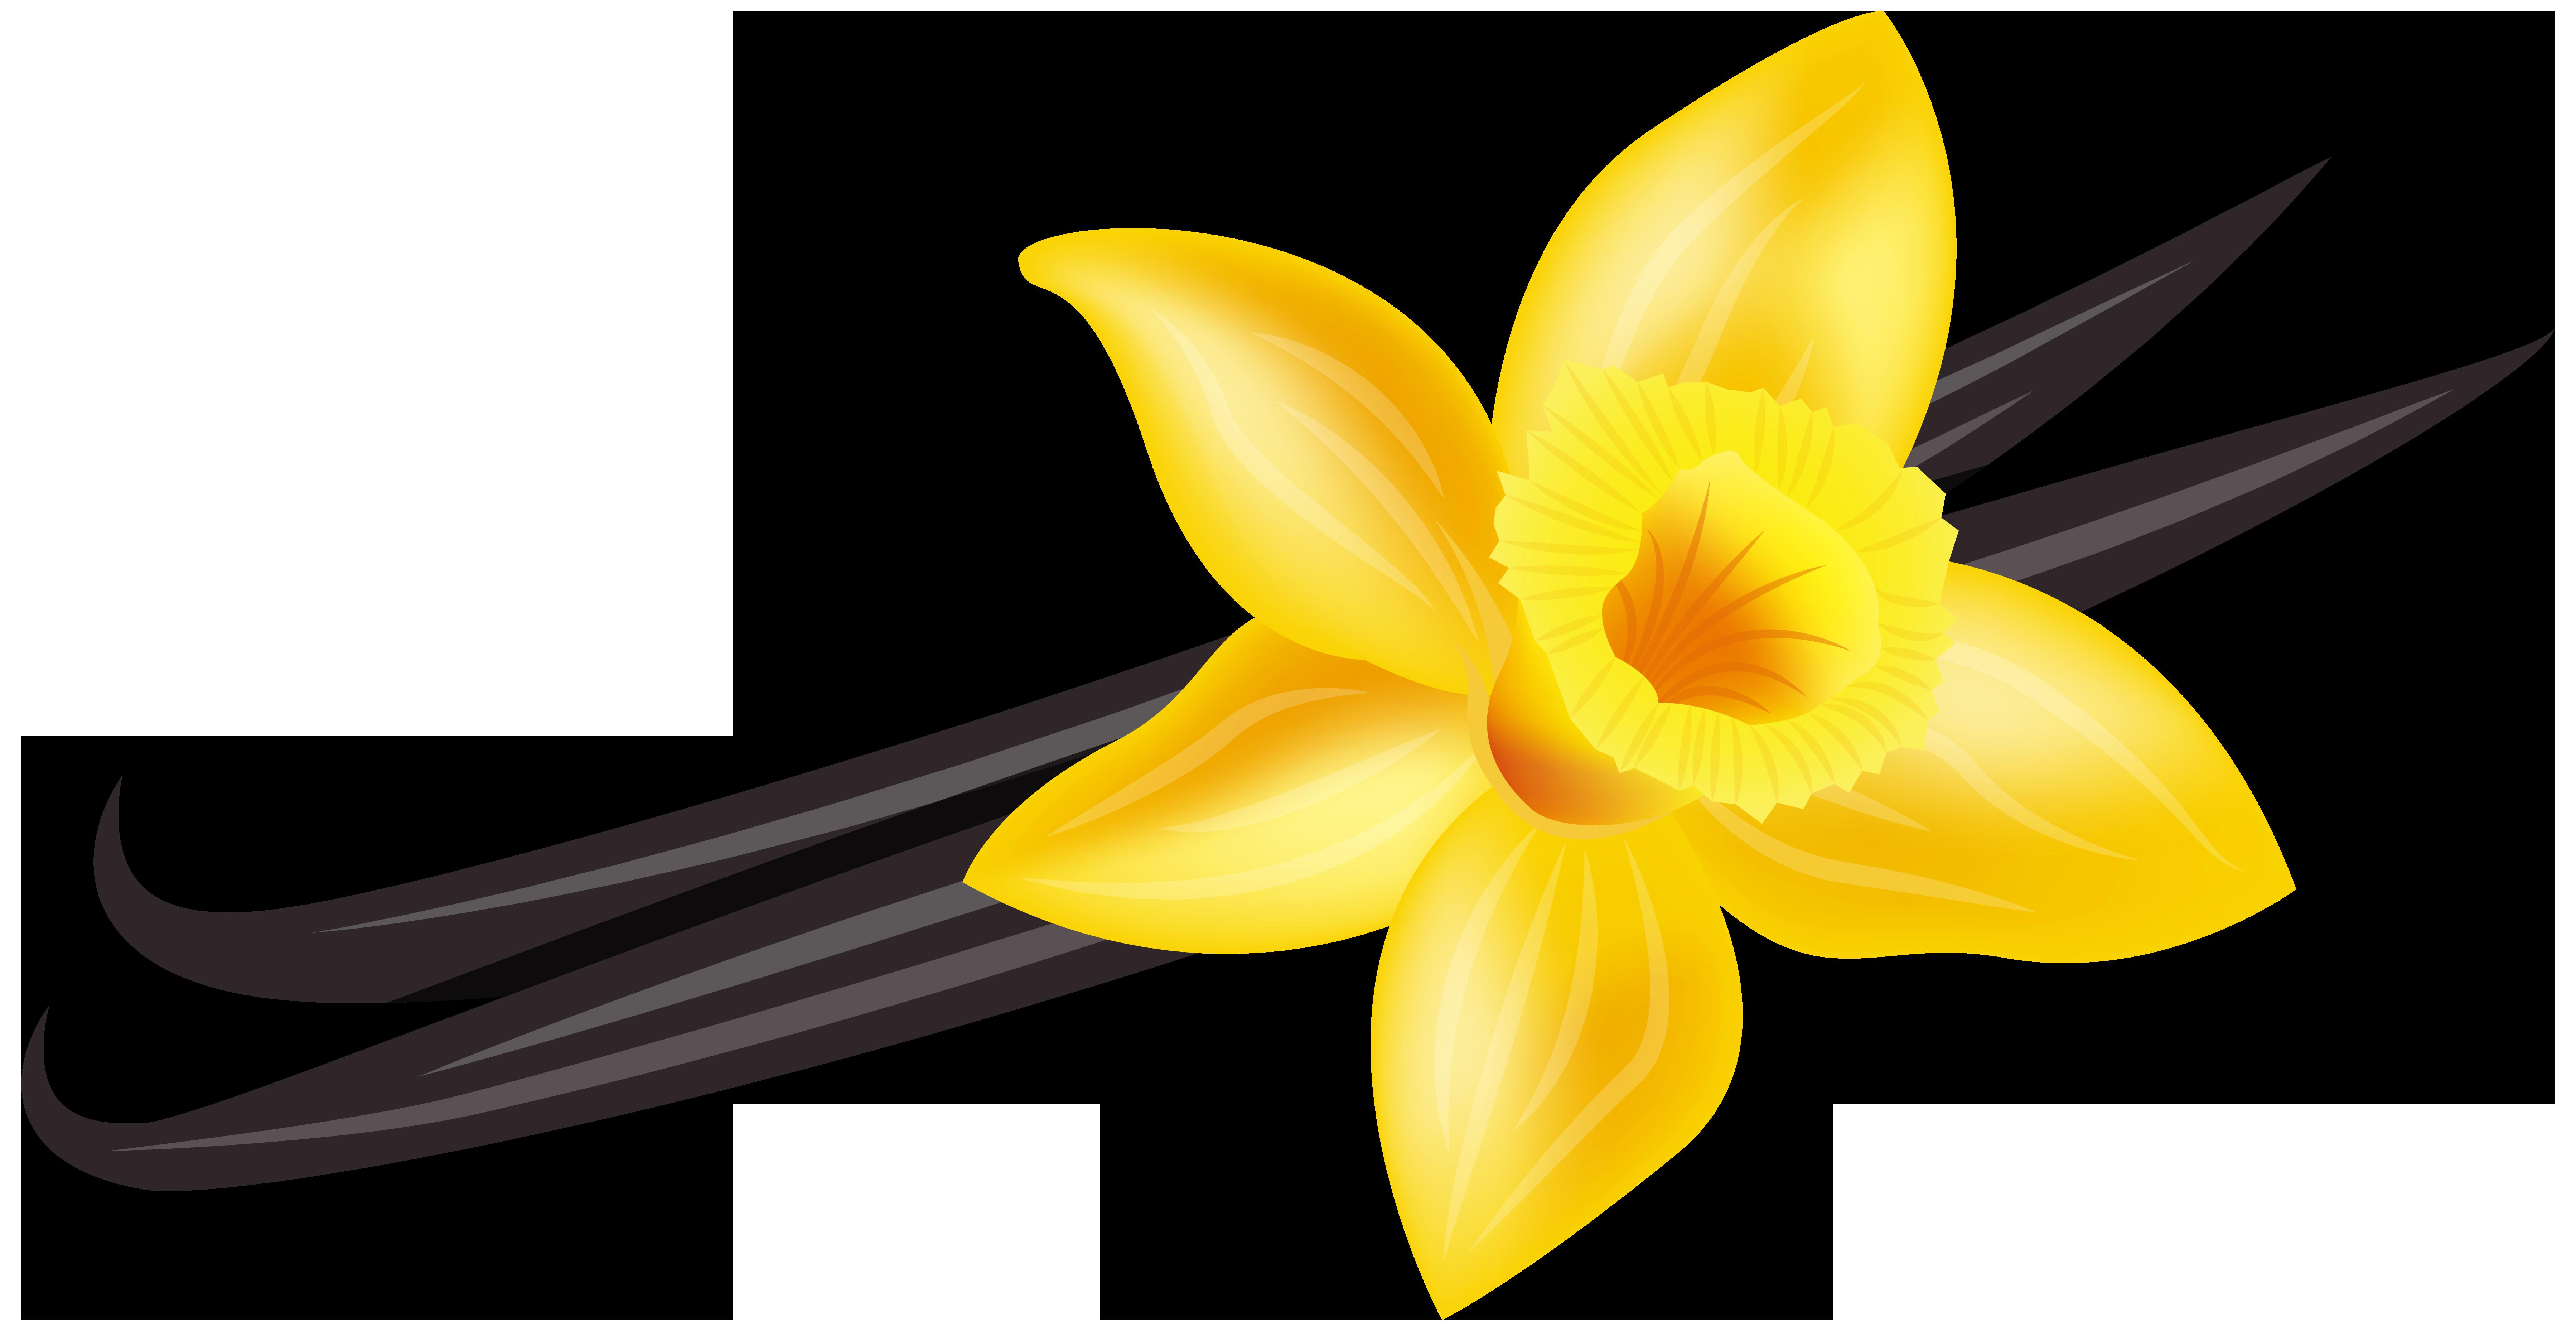 Vanilla flower clipart jpg free download 28+ Collection of Vanilla Flower Clipart | High quality, free ... jpg free download